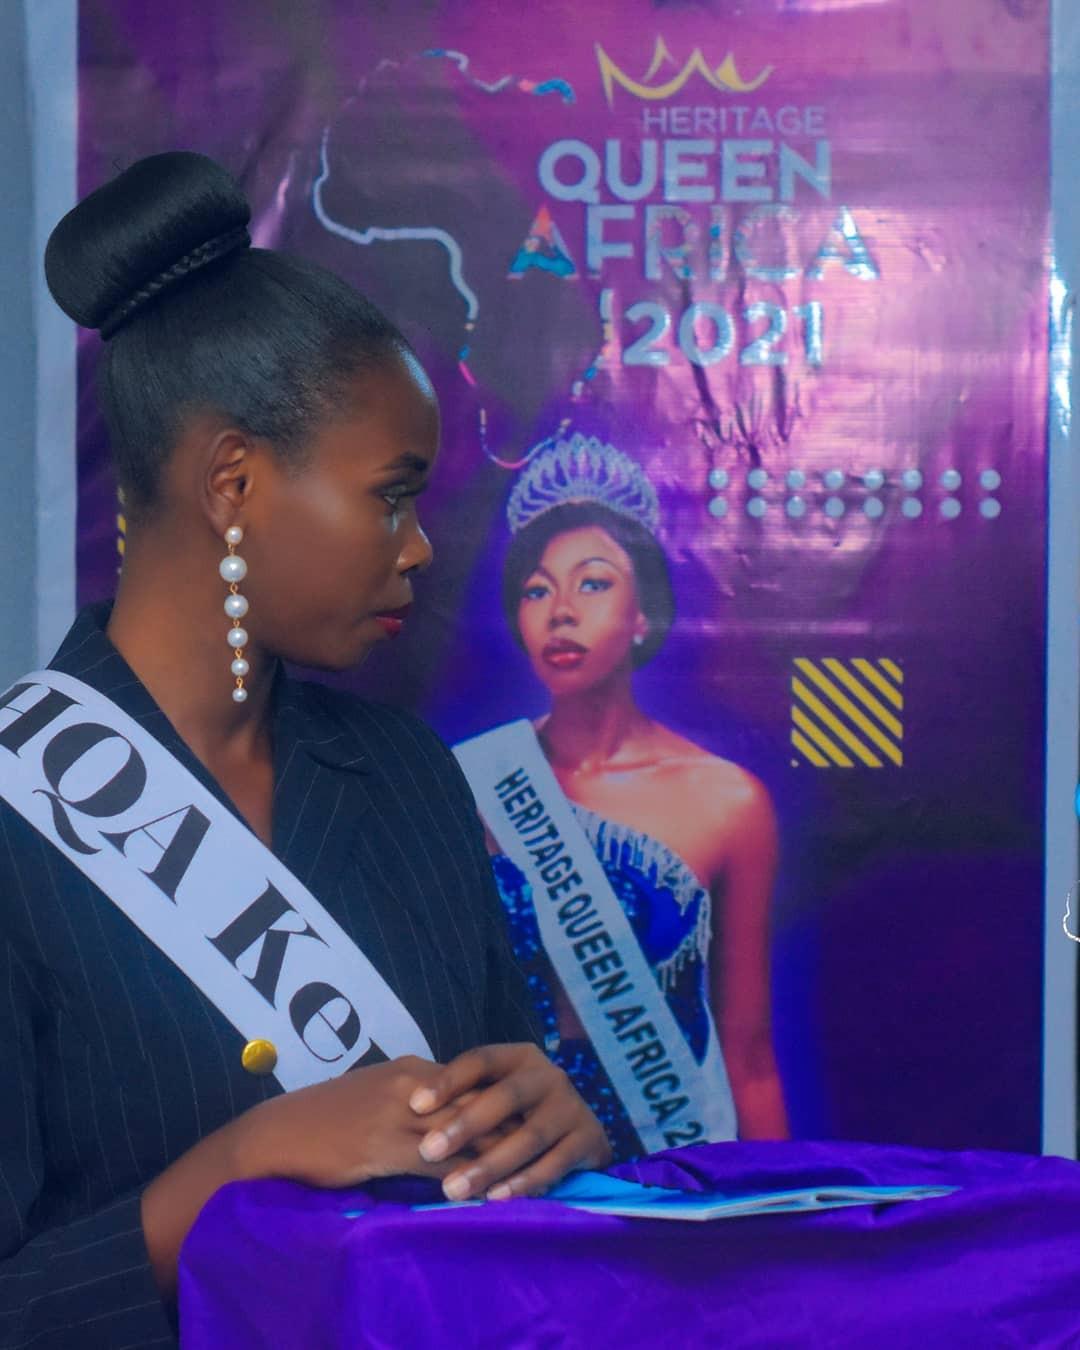 candidatas a heritage queen africa 2021. final: 19 june. - Página 5 NPKr22